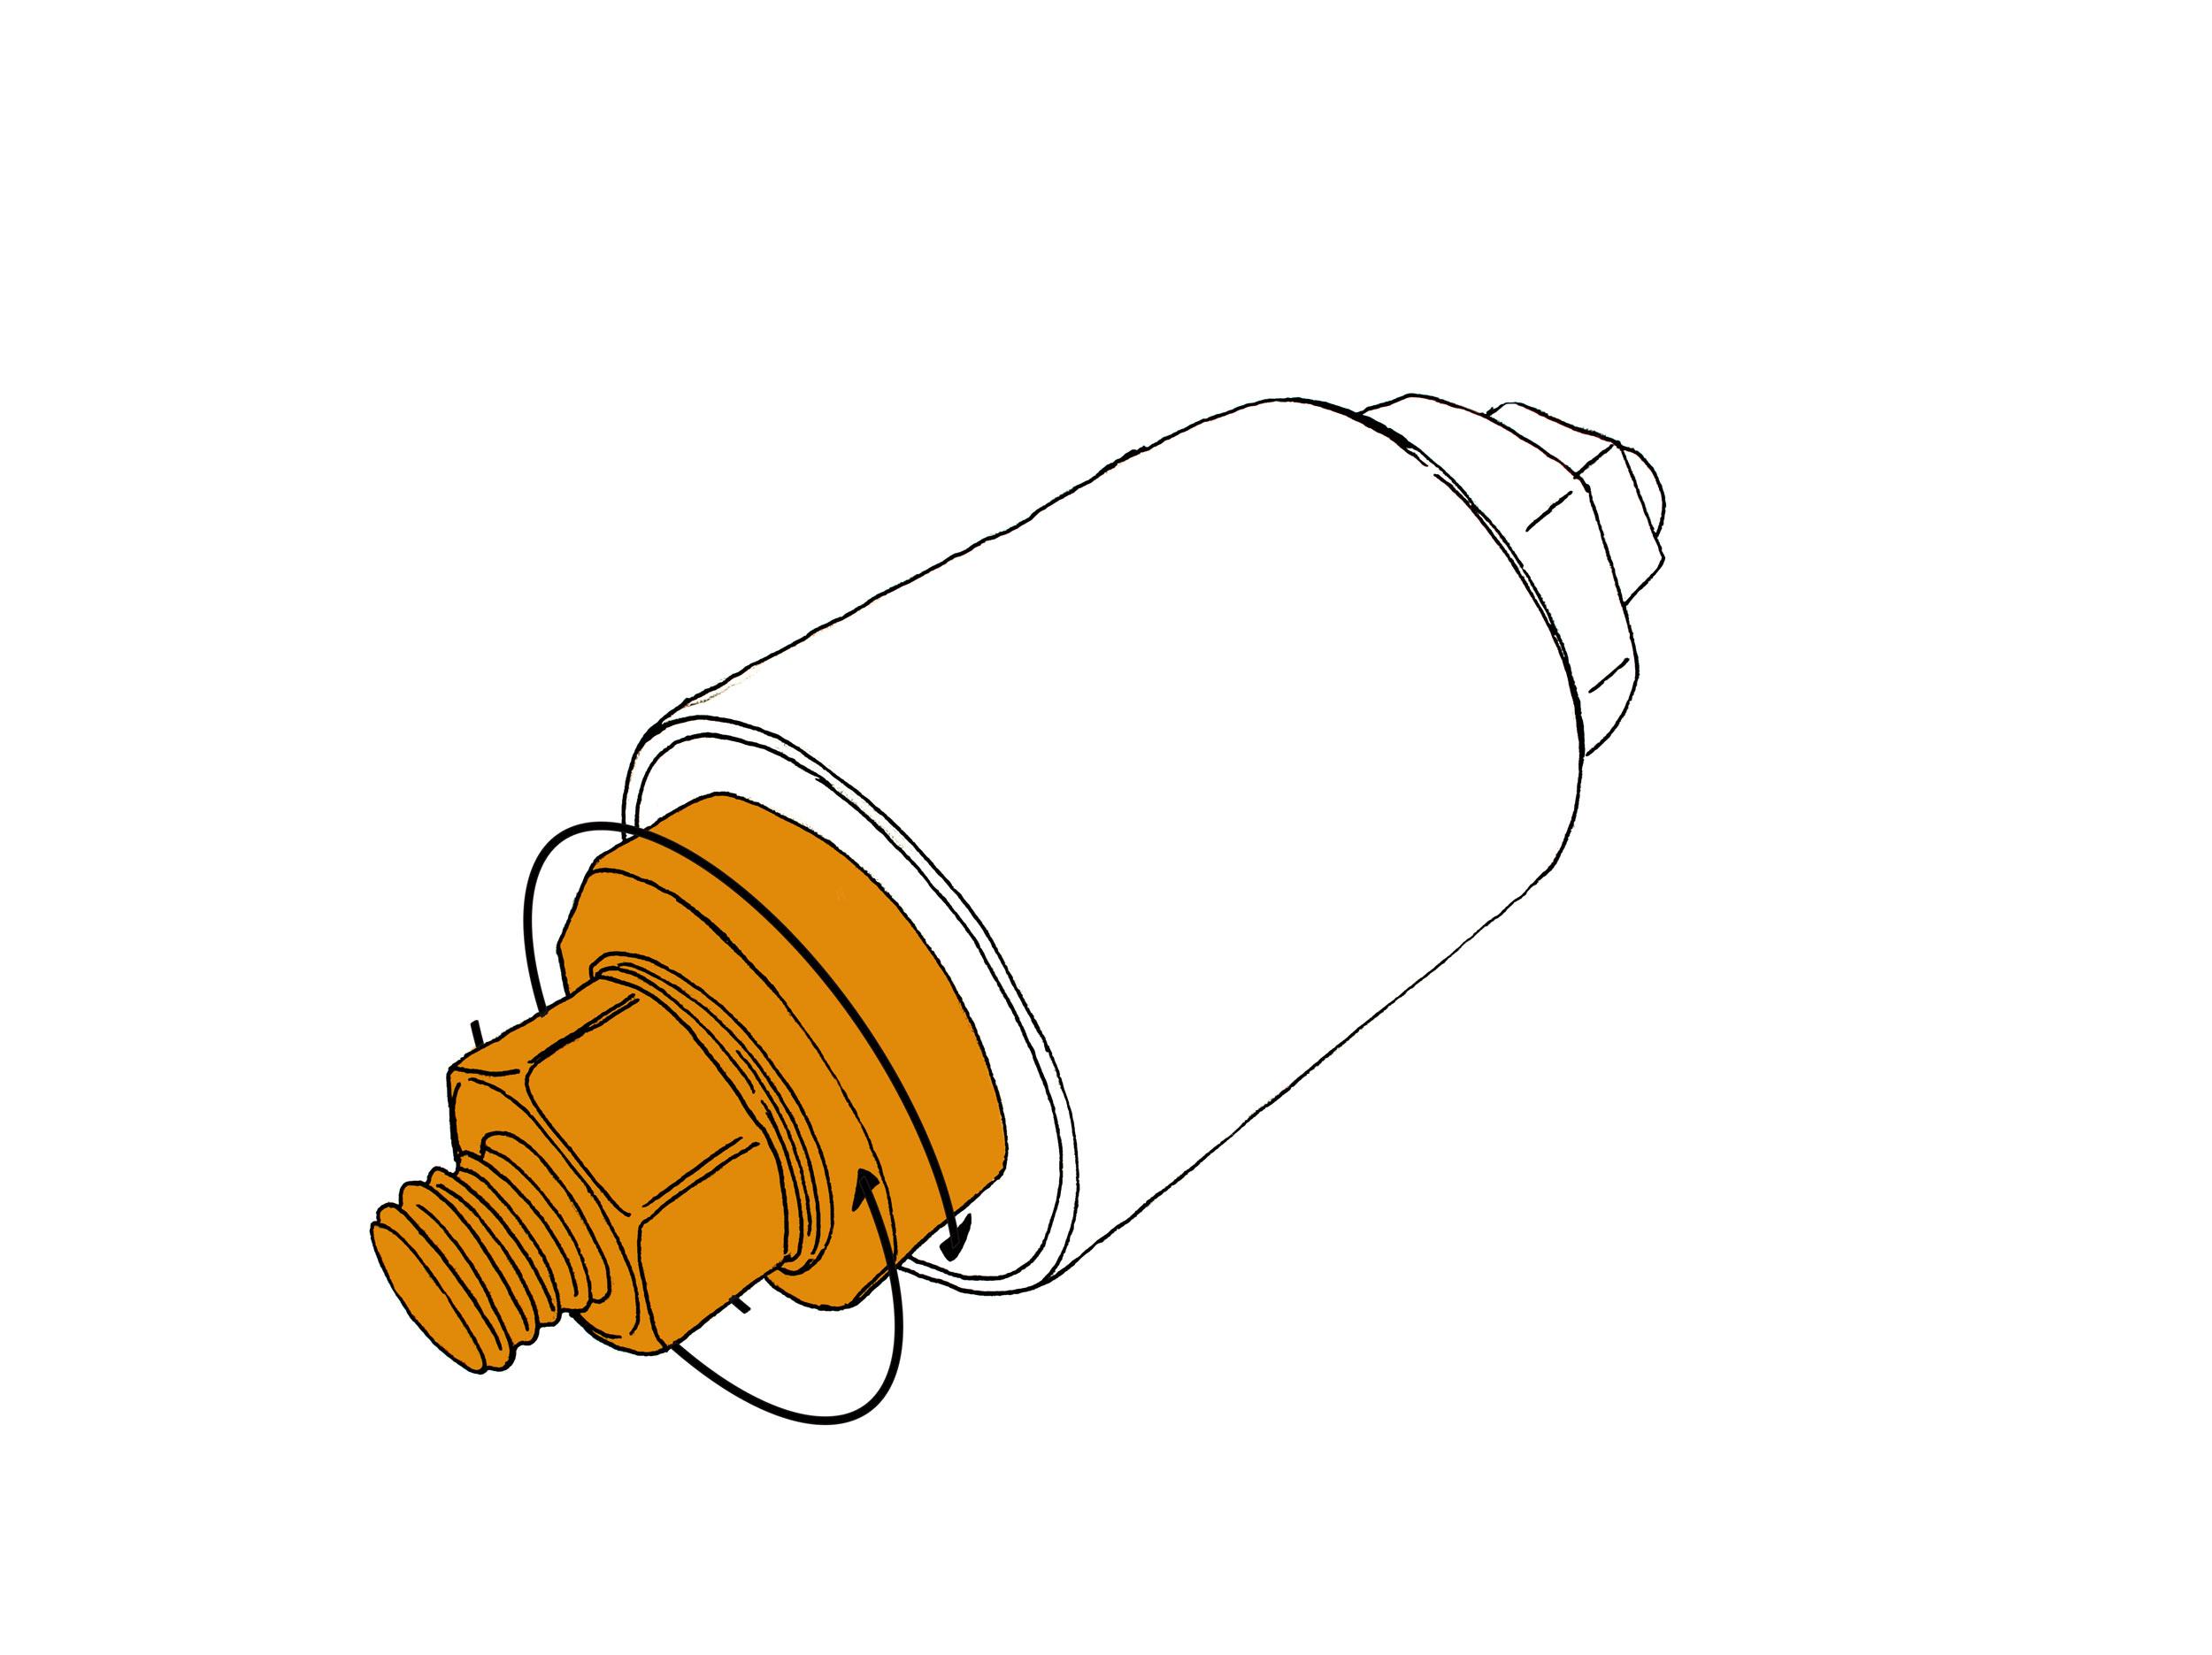 2500x1871 Single Contact Rotary Ground Clamp (Rotocon Mc)